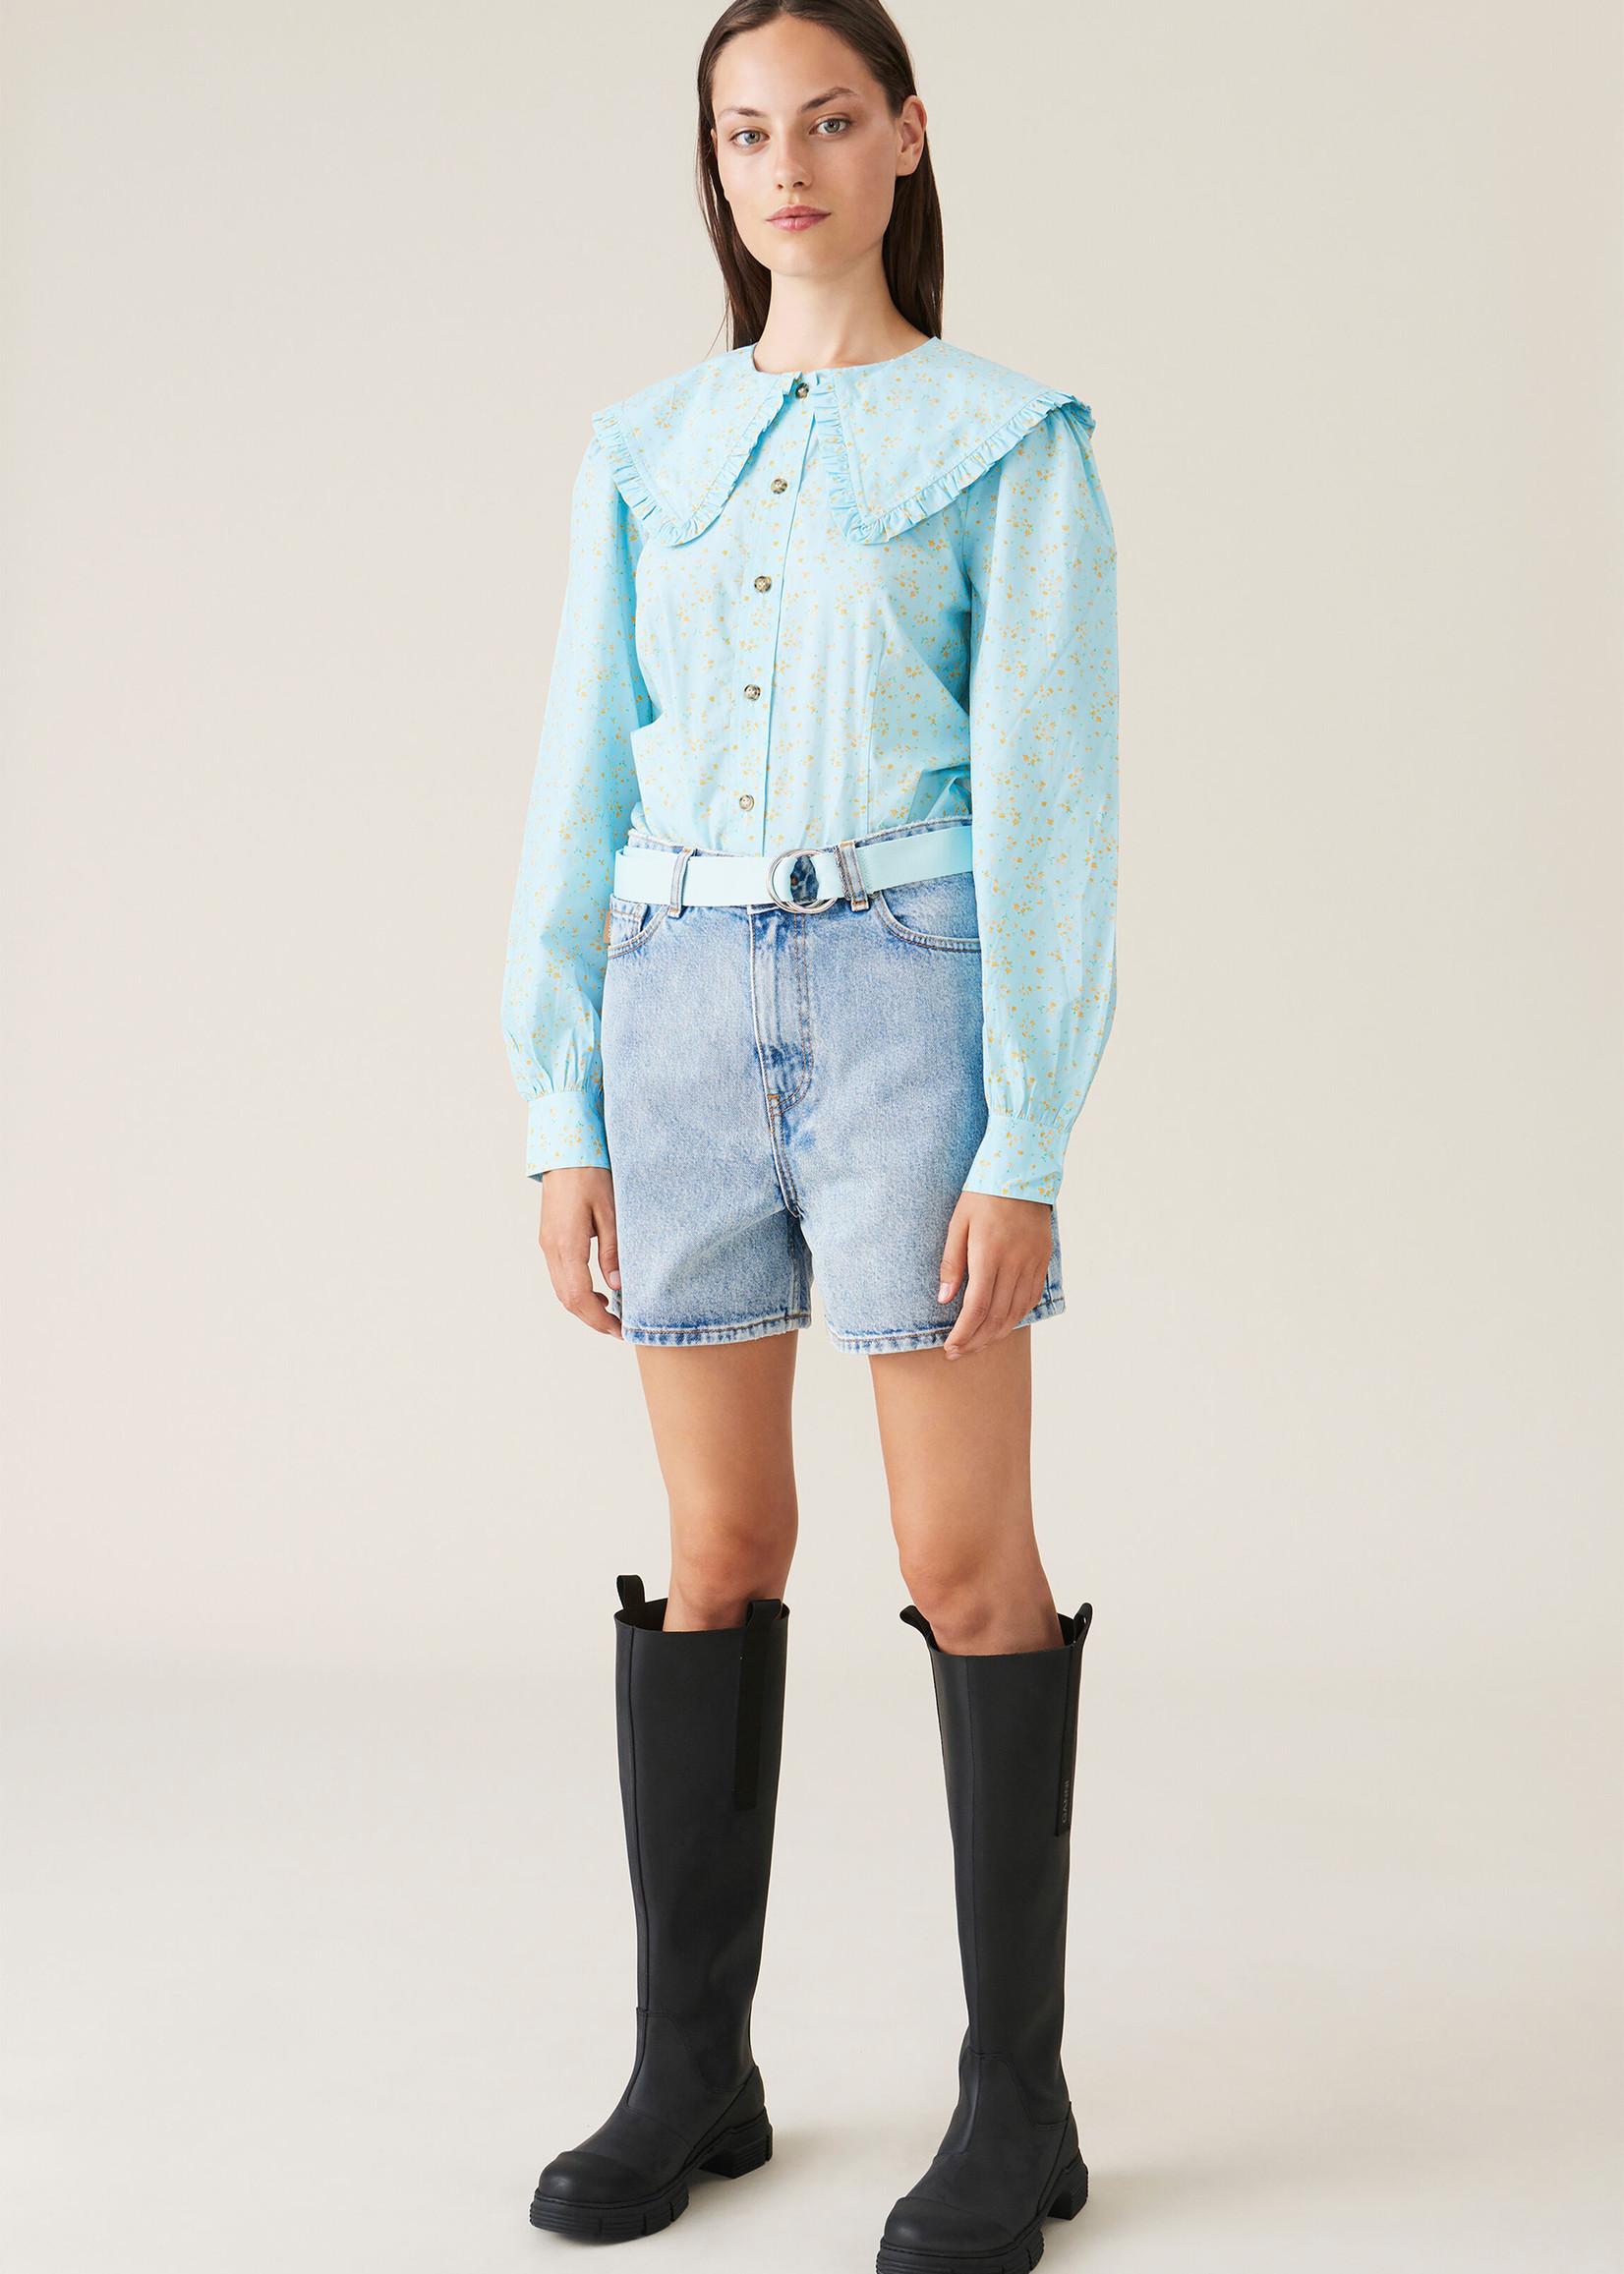 GANNI High Waist Denim Shorts